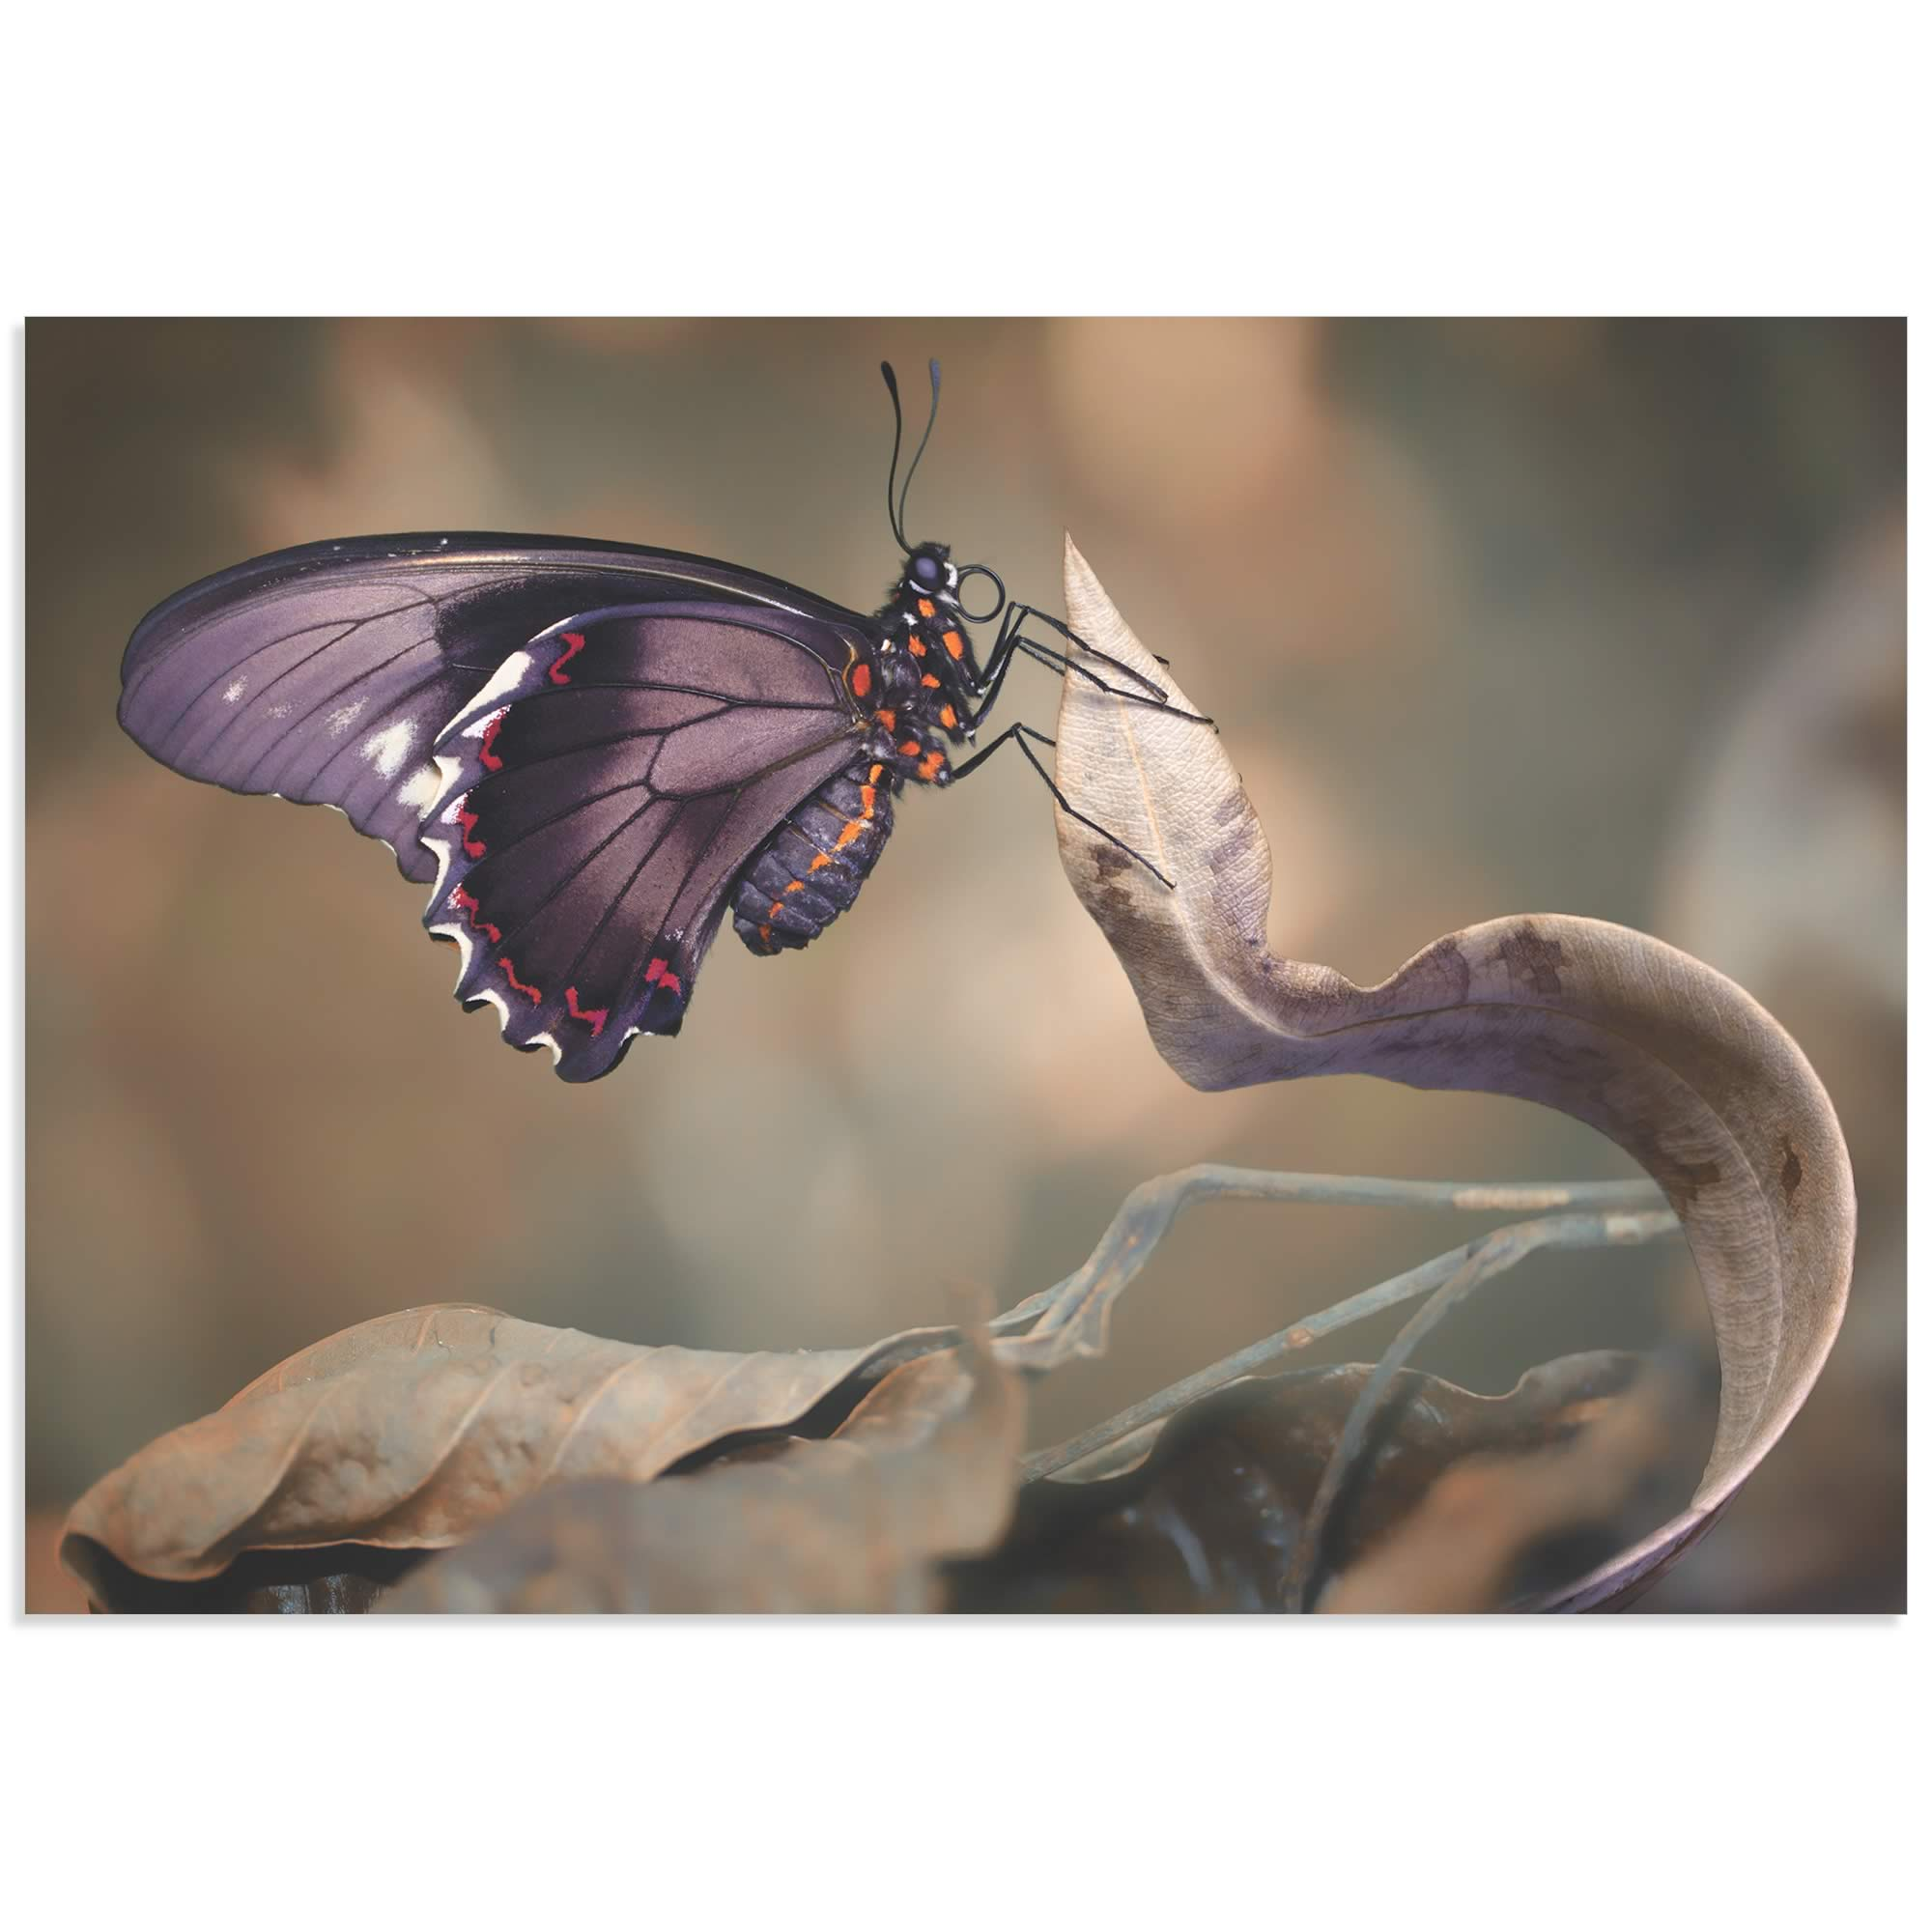 Swallowtail Butterfly by Jimmy Hoffman - Butterfly Wall Art on Metal or Acrylic